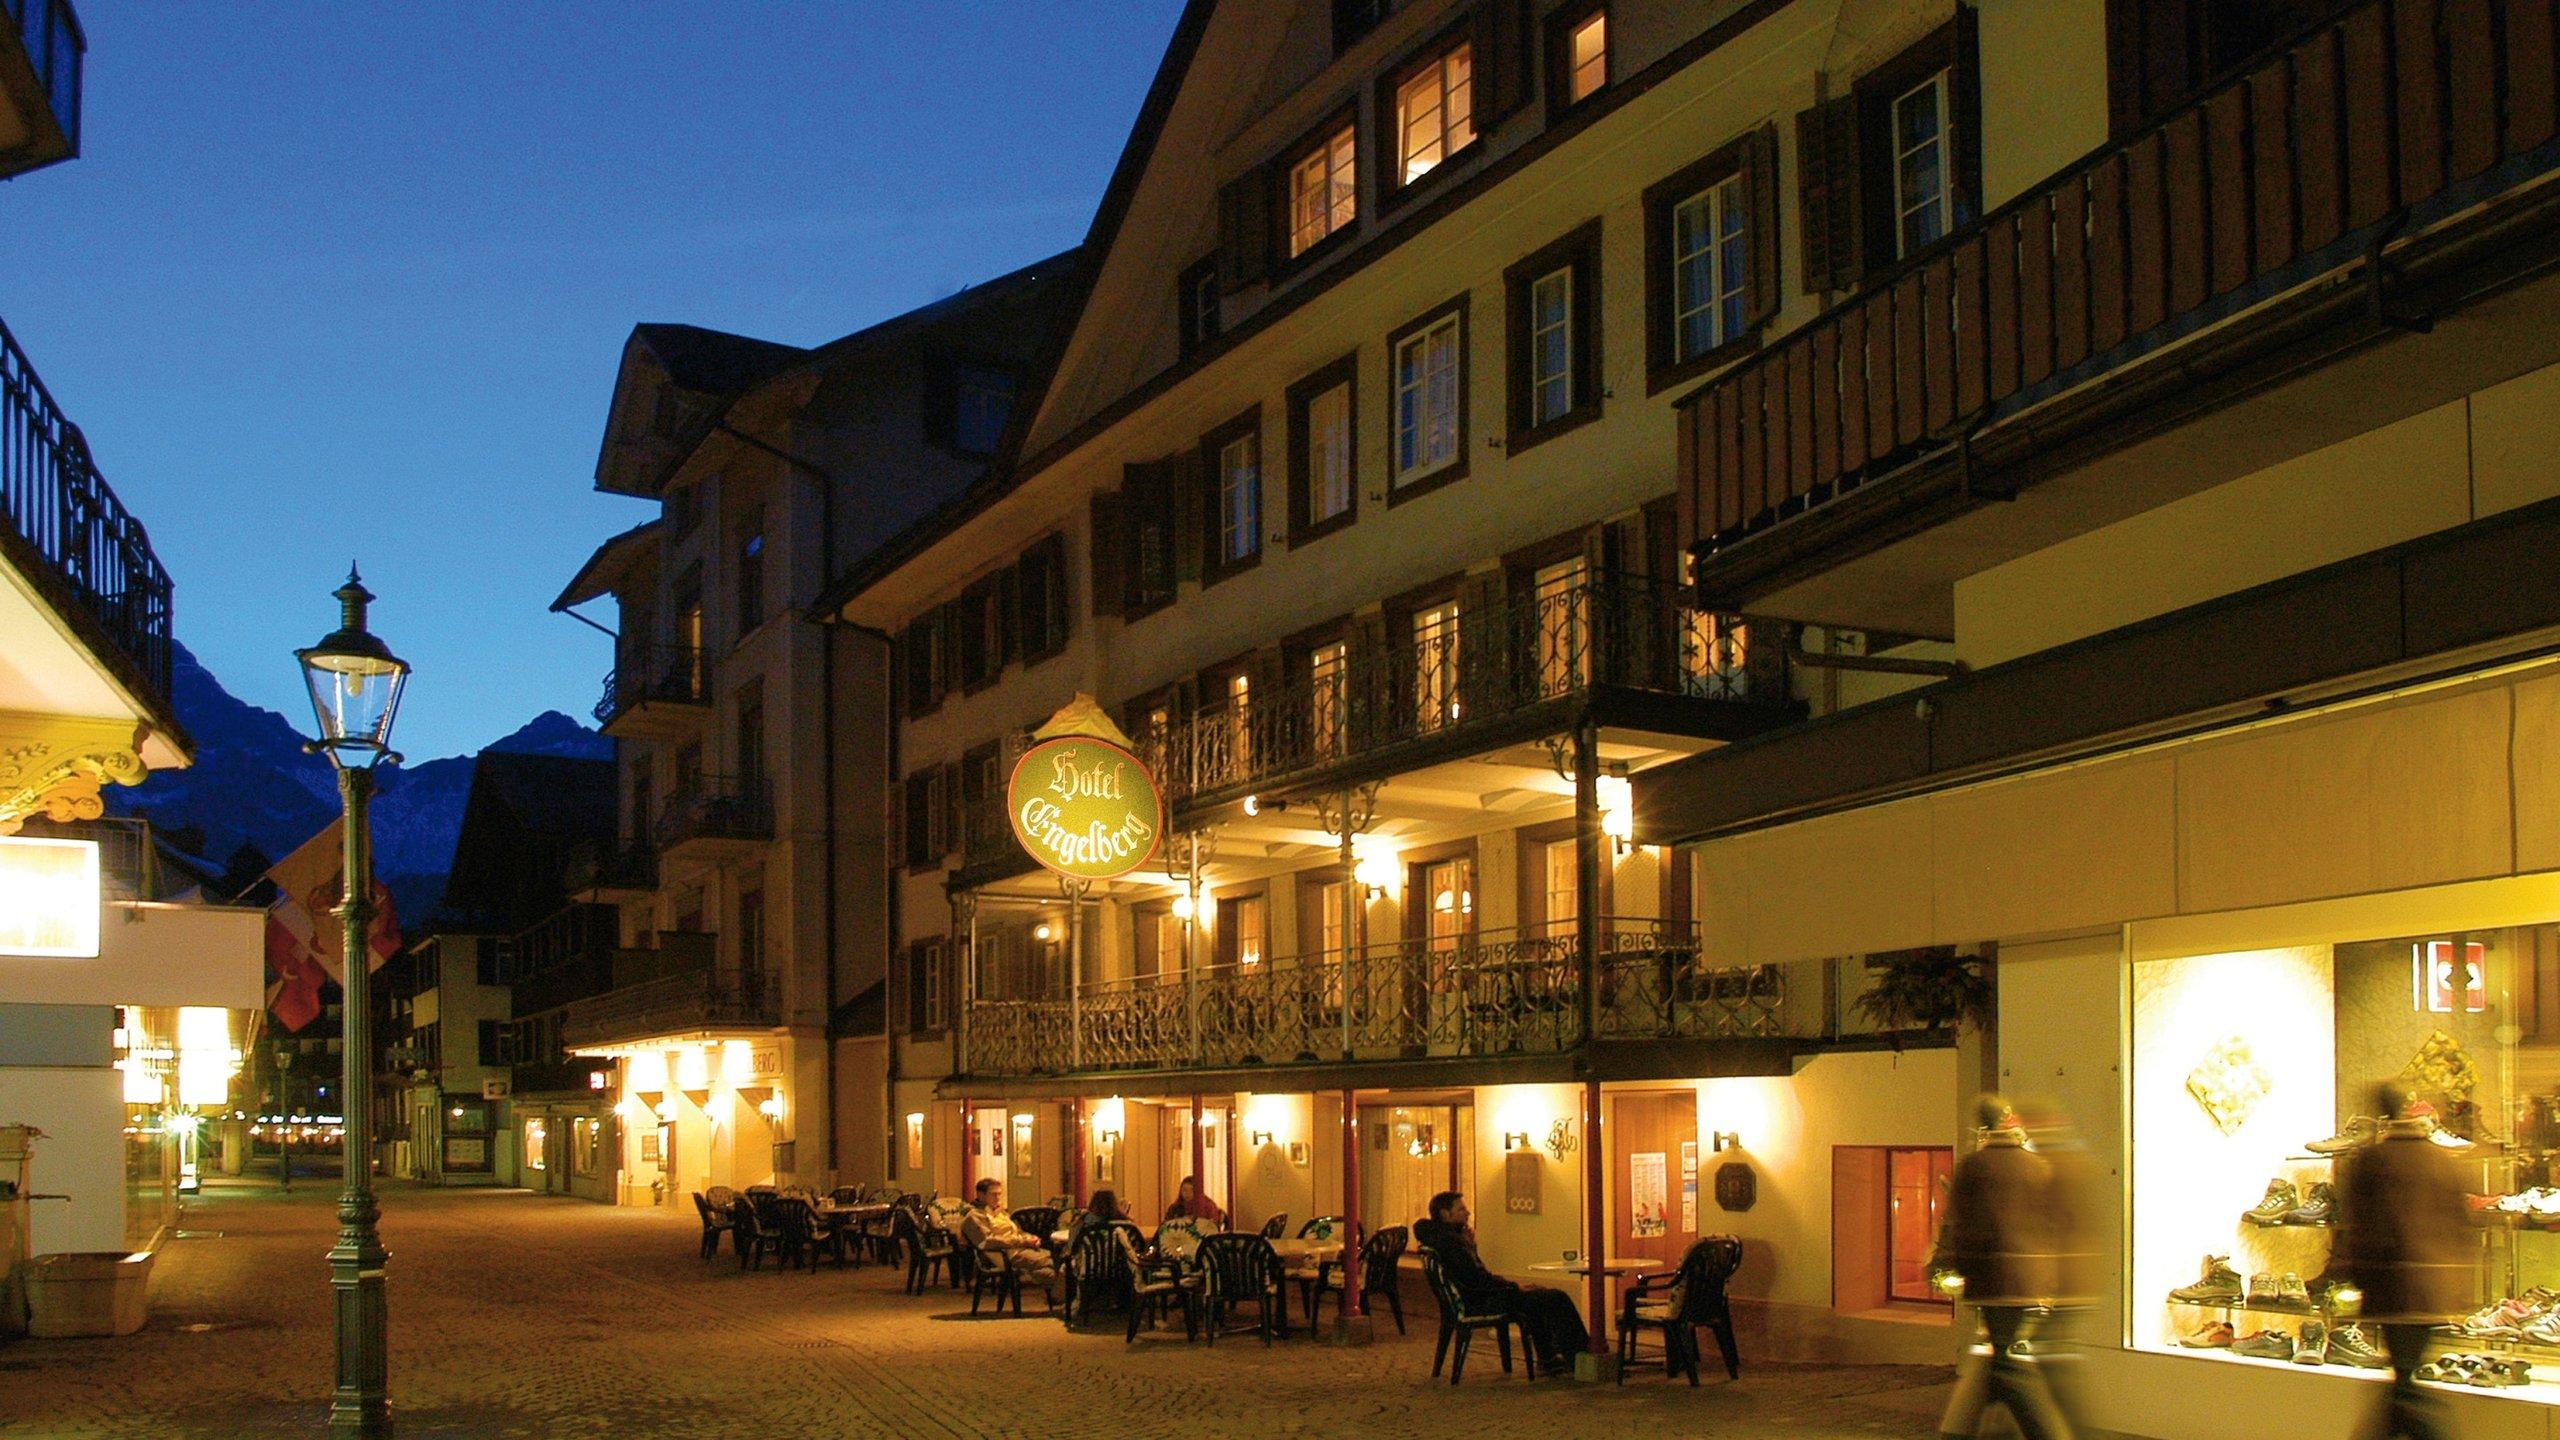 Canton of Obwalden, Switzerland